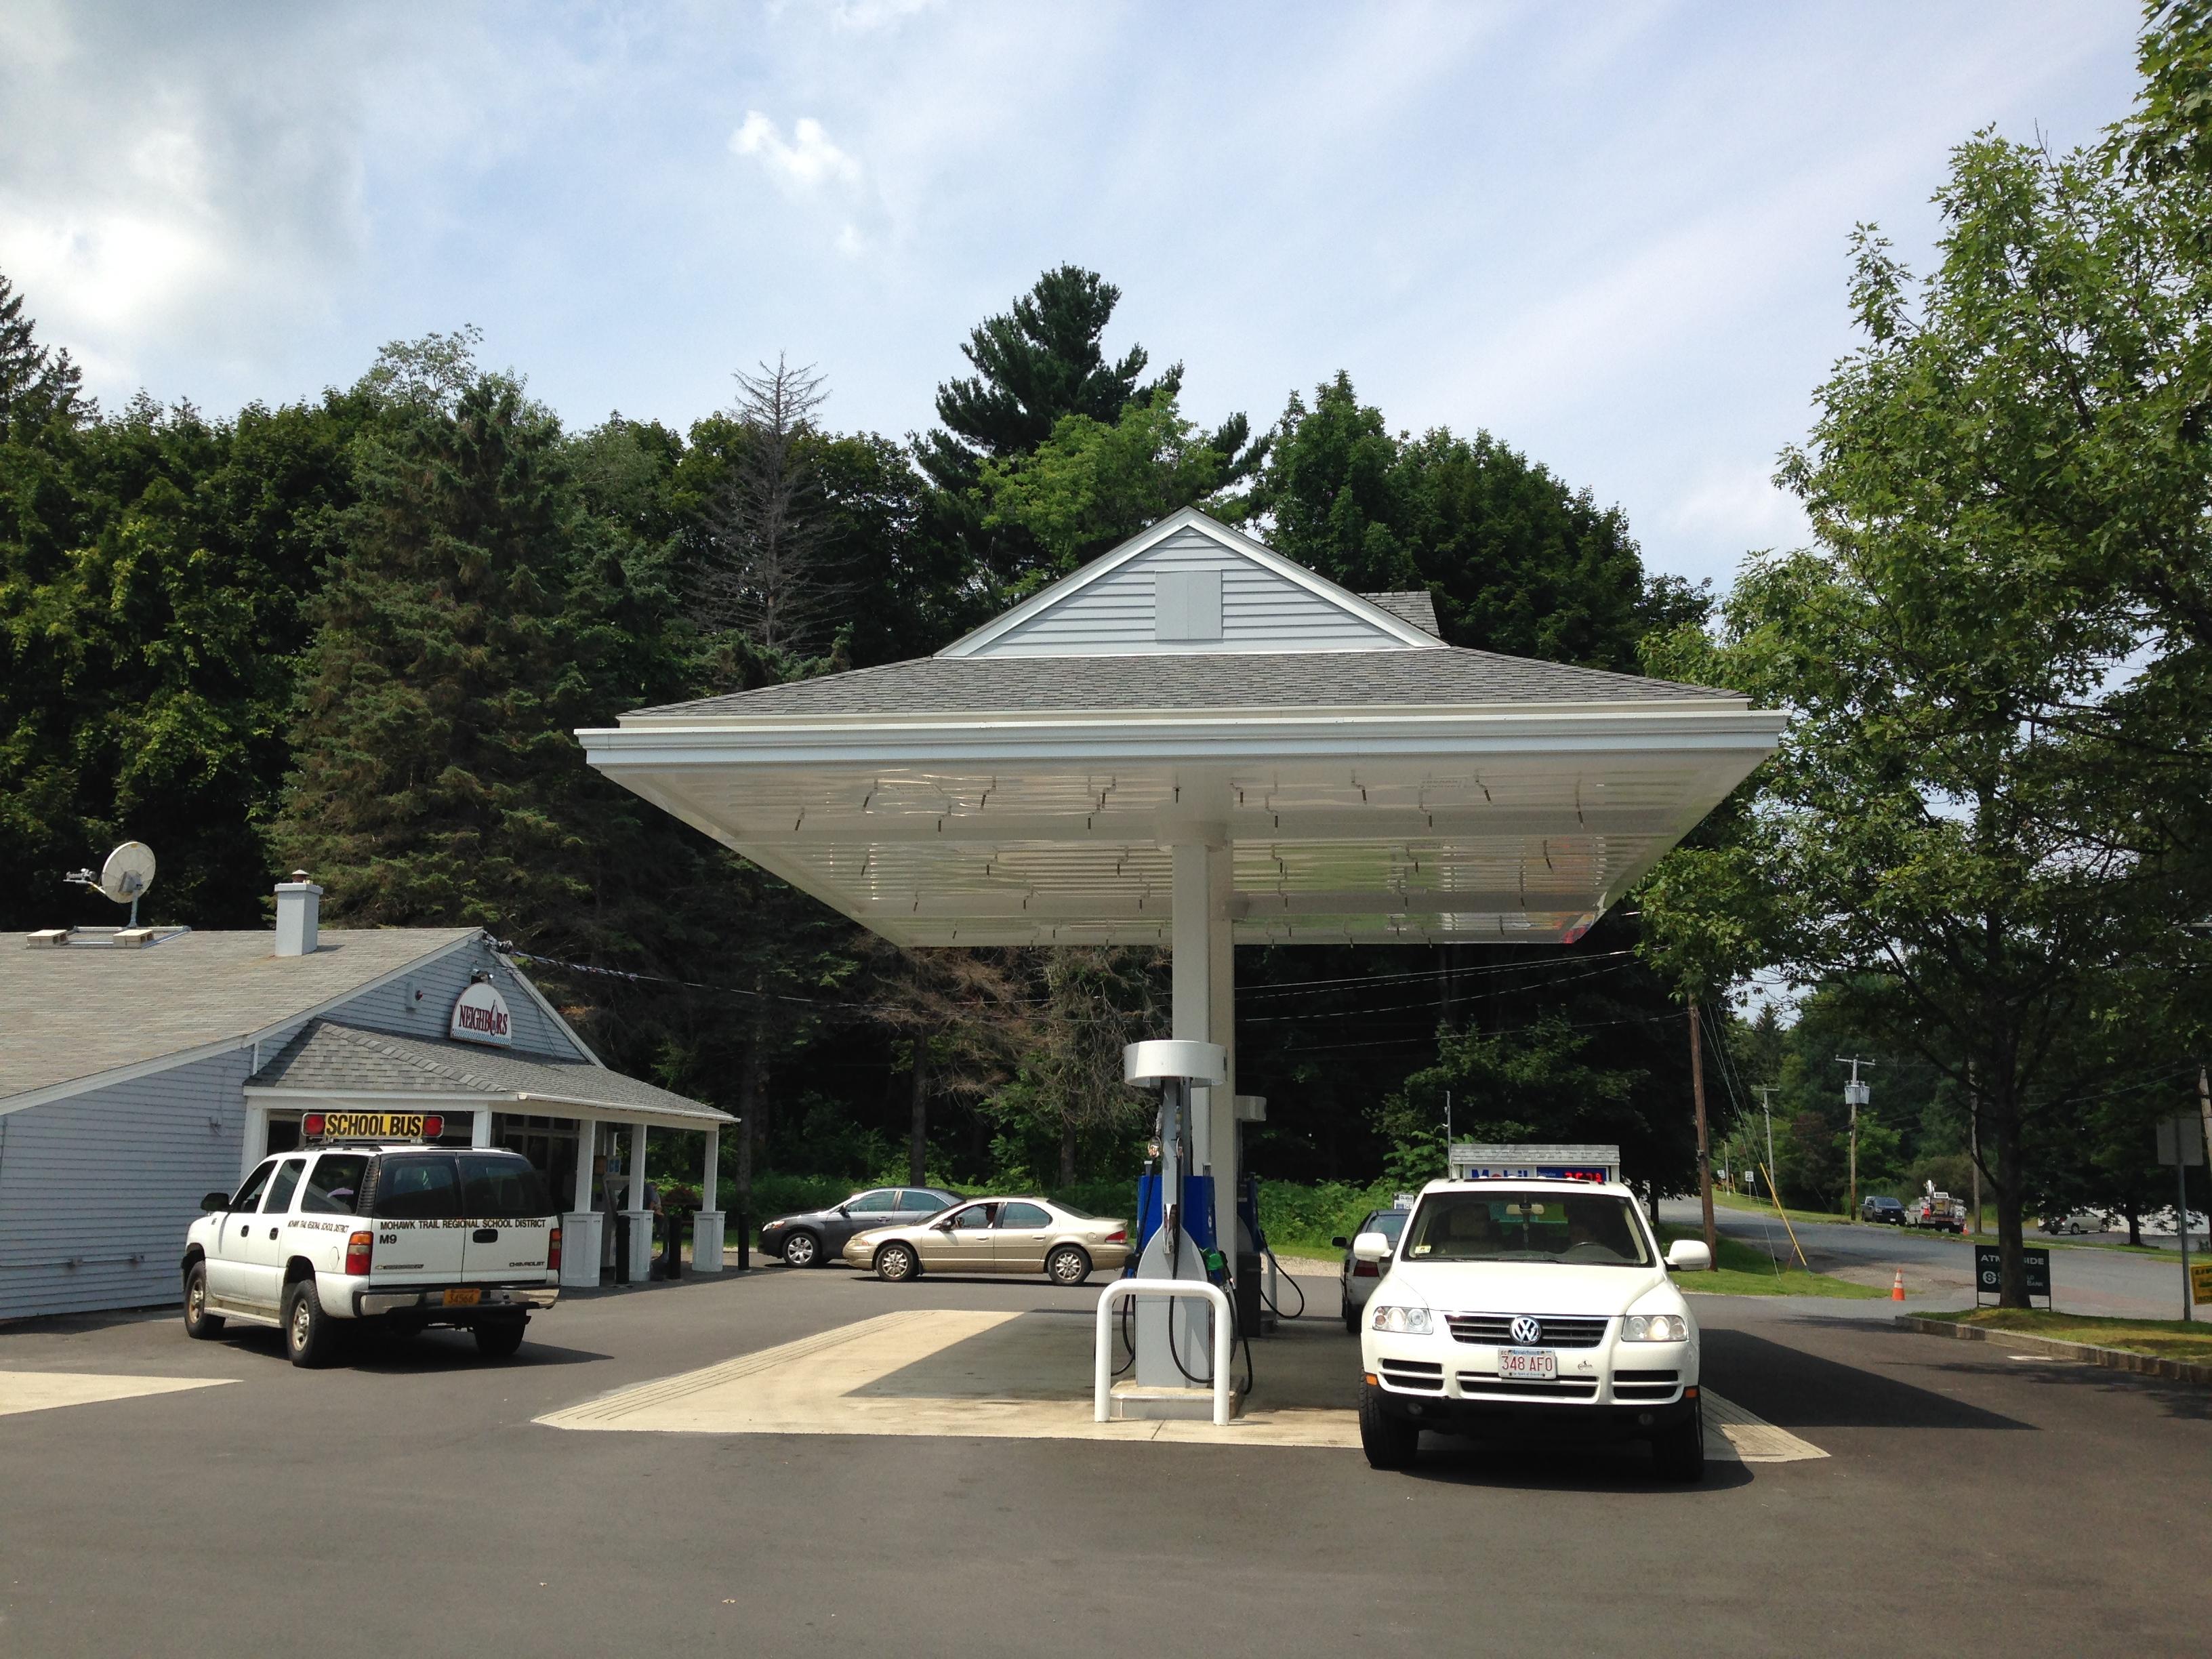 Ashfield Canopy Mobil Gas Station